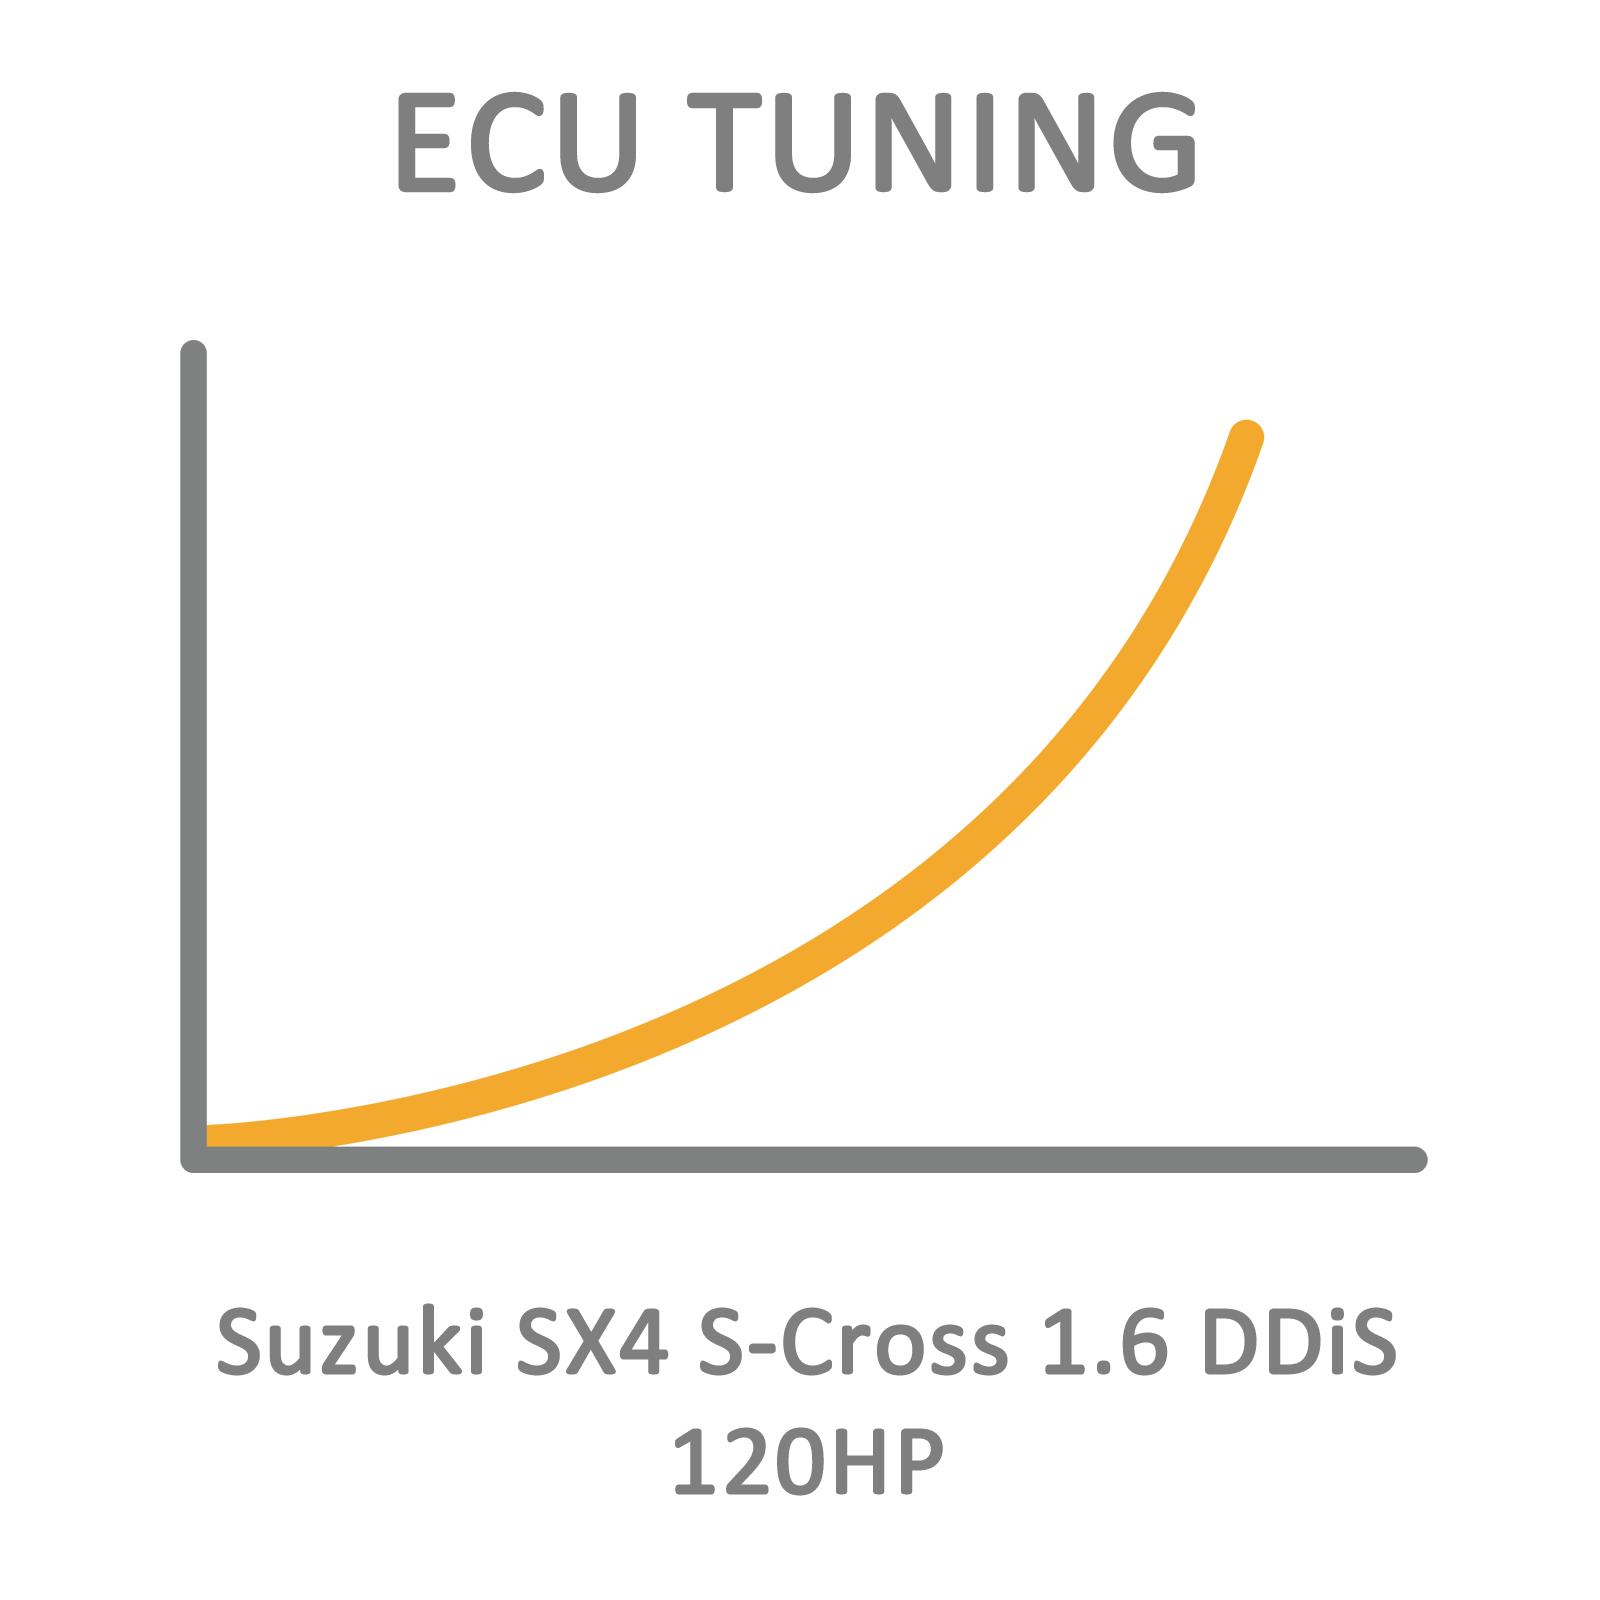 Suzuki SX4 S-Cross 1.6 DDiS 120HP ECU Tuning Remapping